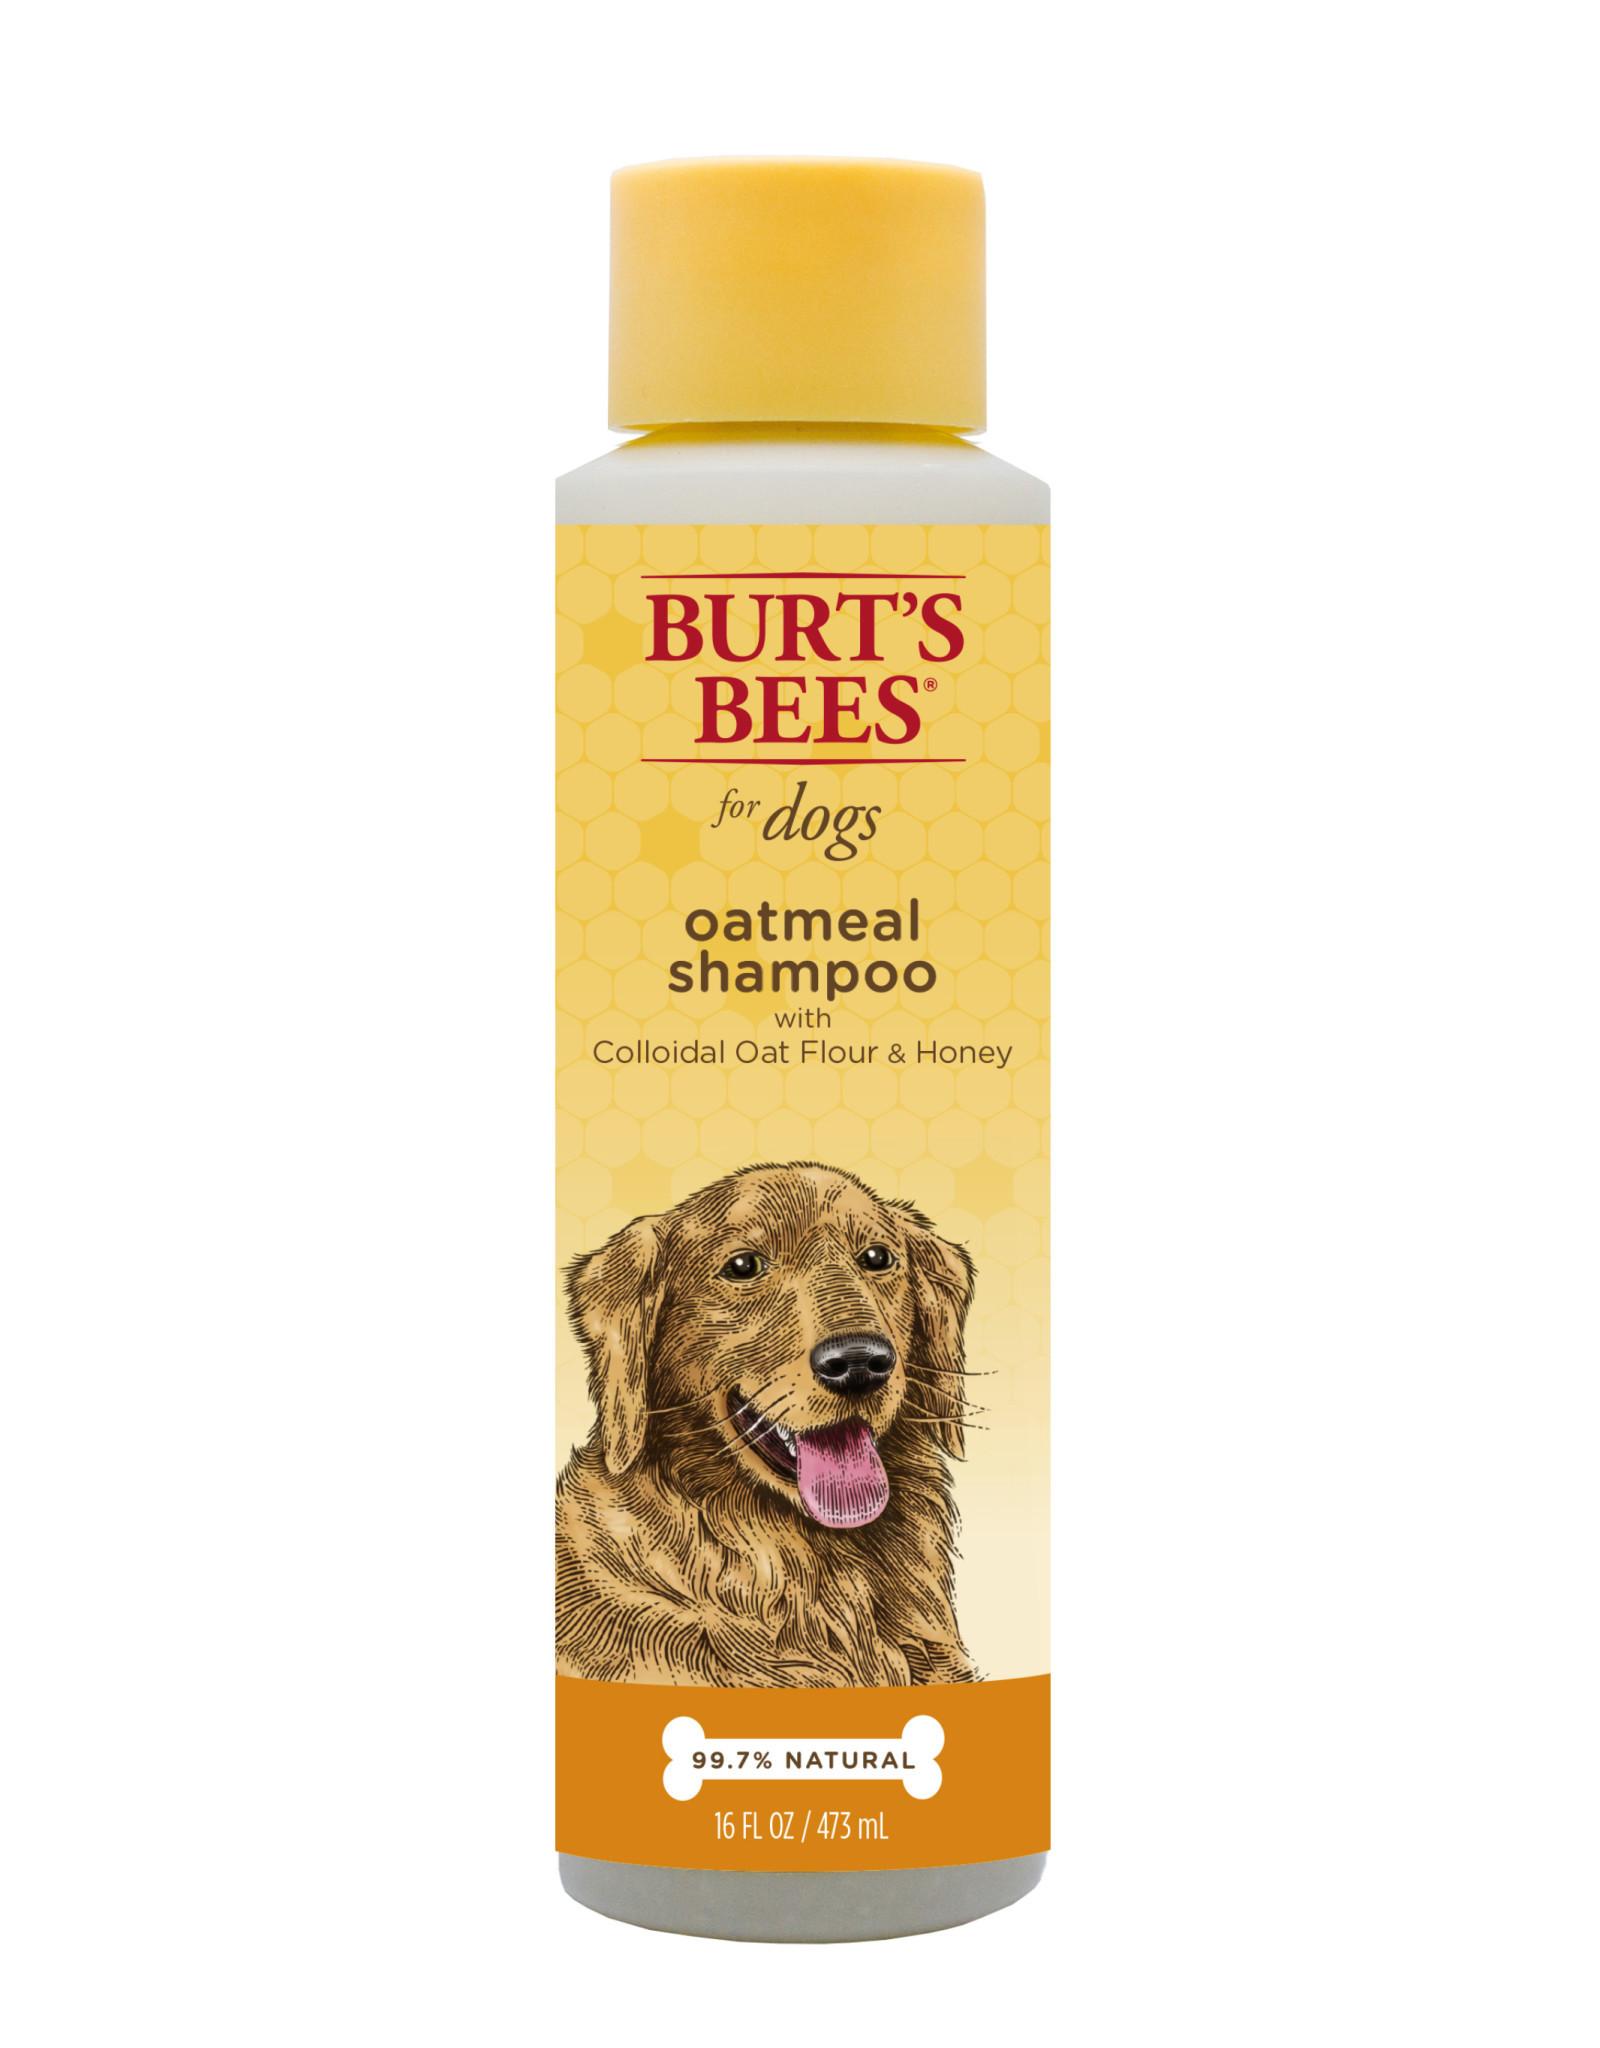 Burt's Bees Shamp.Oatmeal 16oz